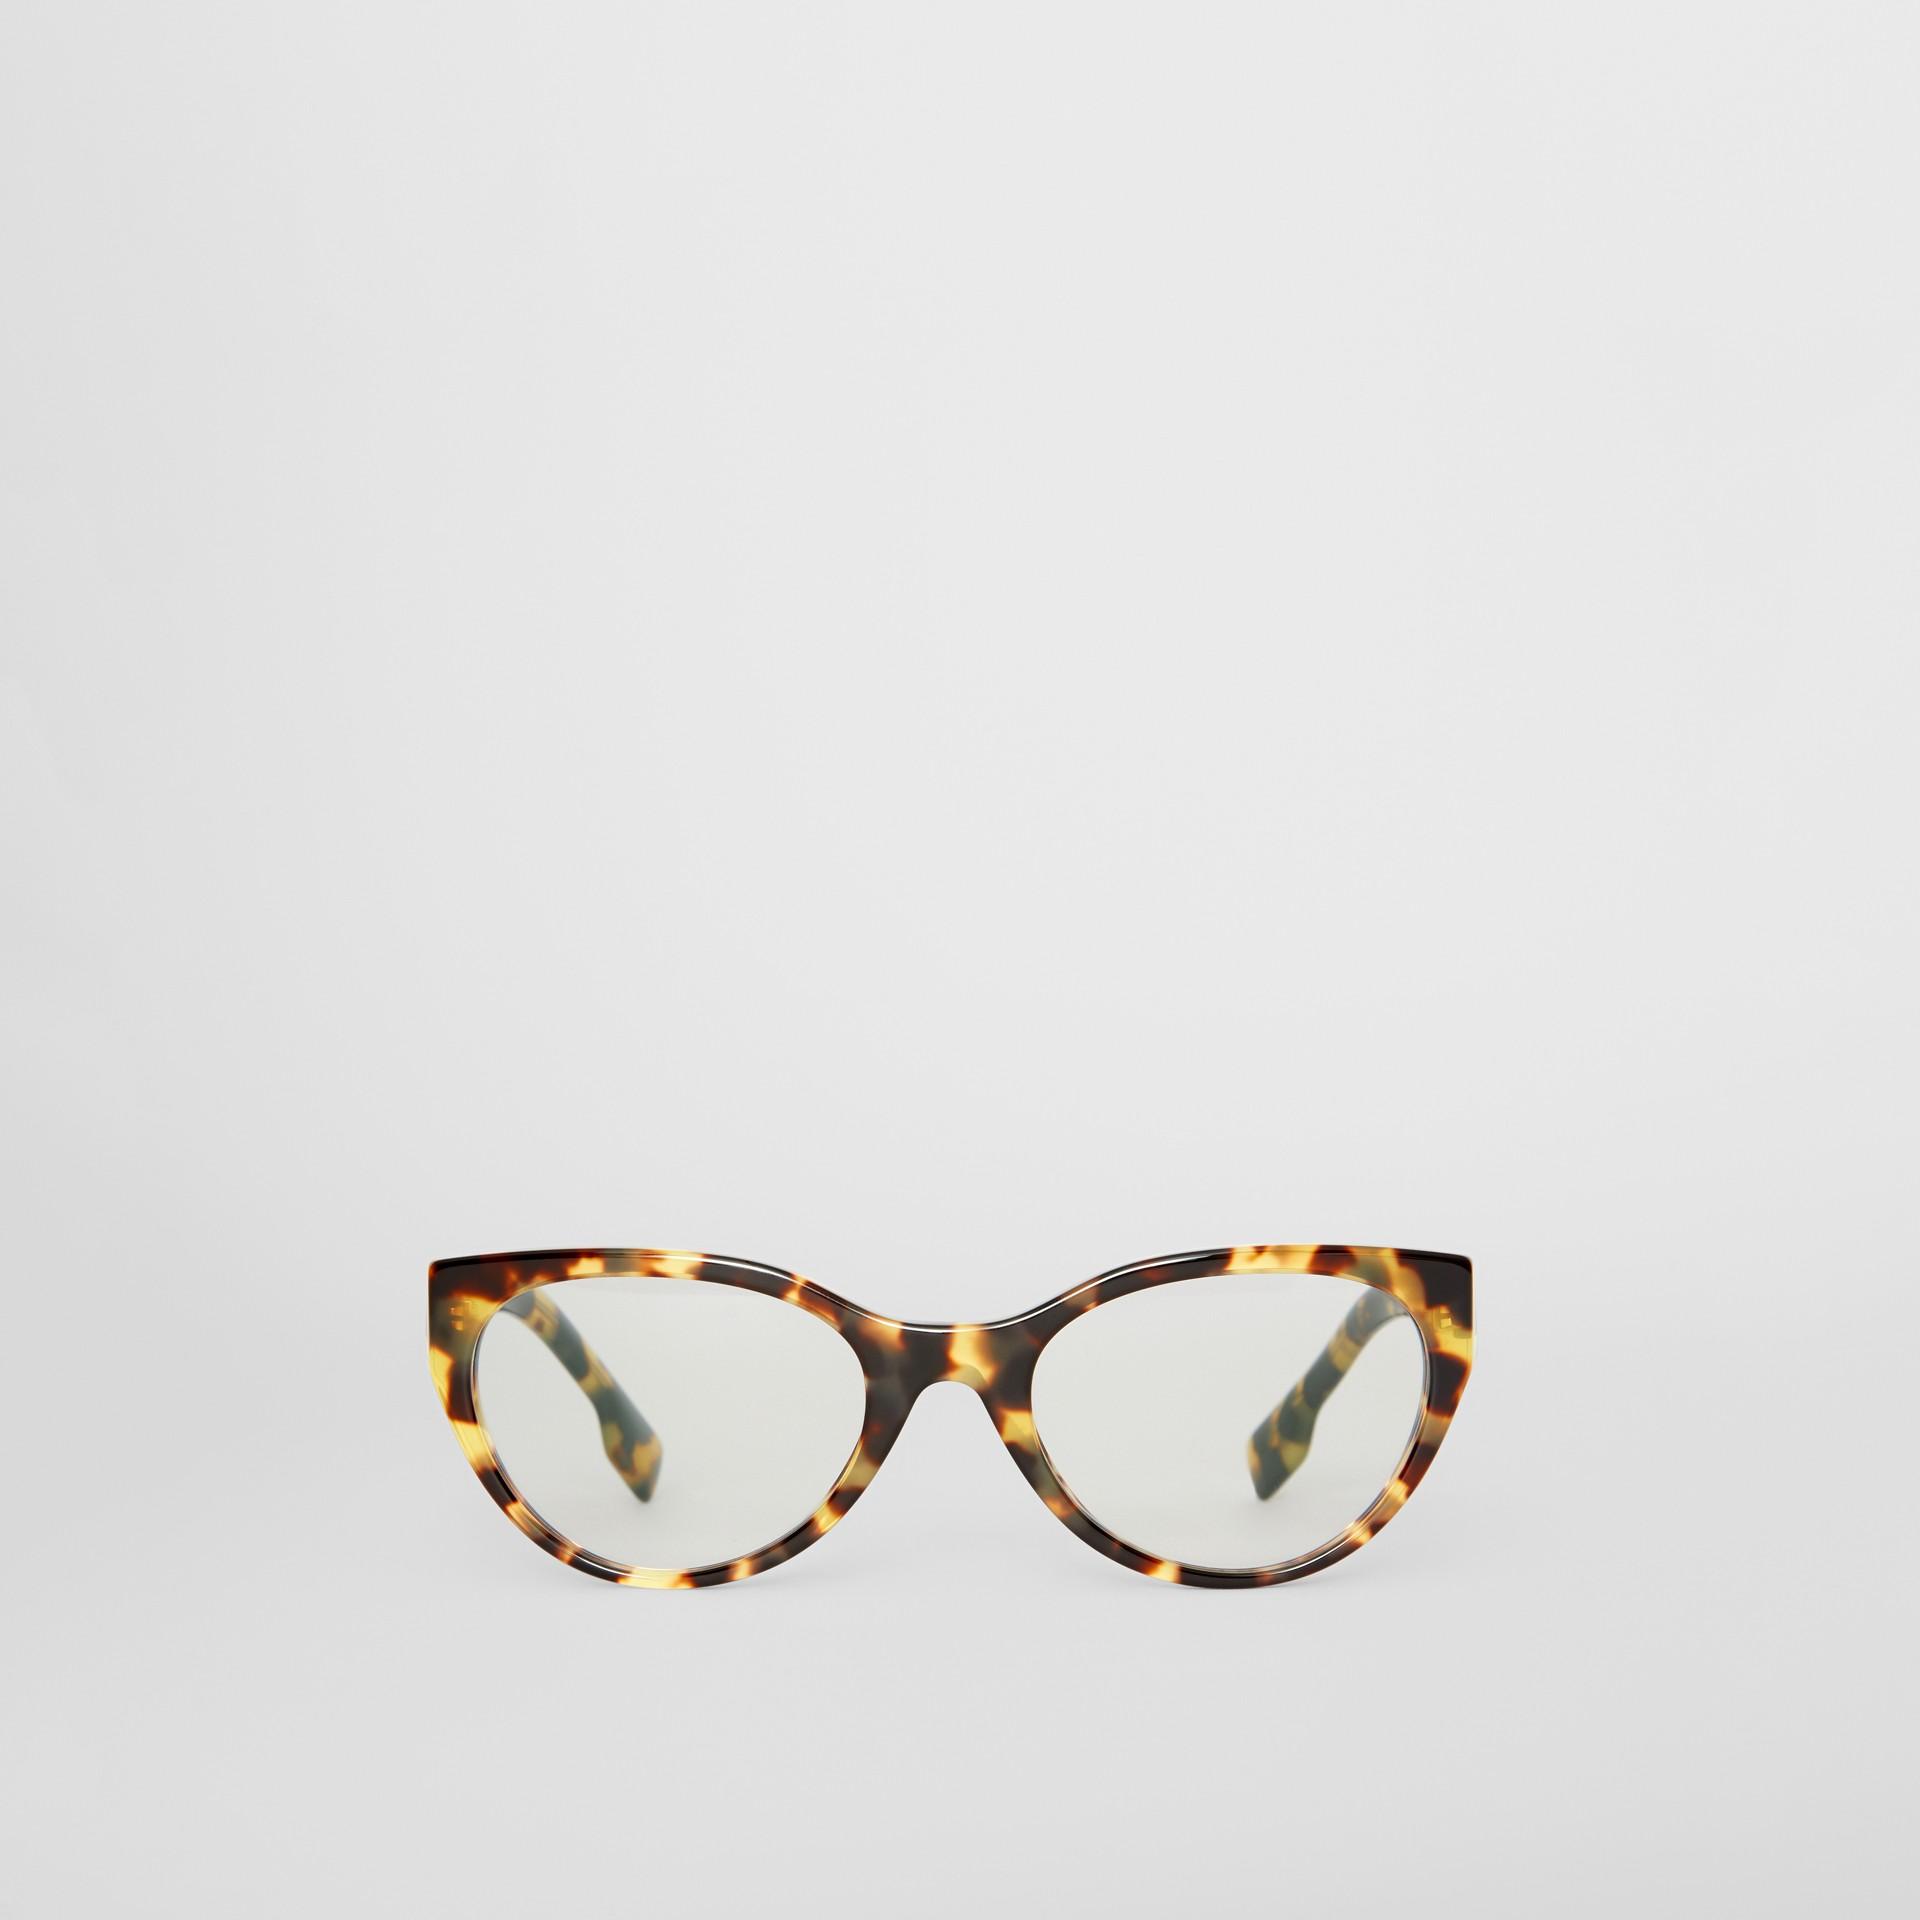 Cat-eye Optical Frames in Tortoise Shell - Women | Burberry - gallery image 0